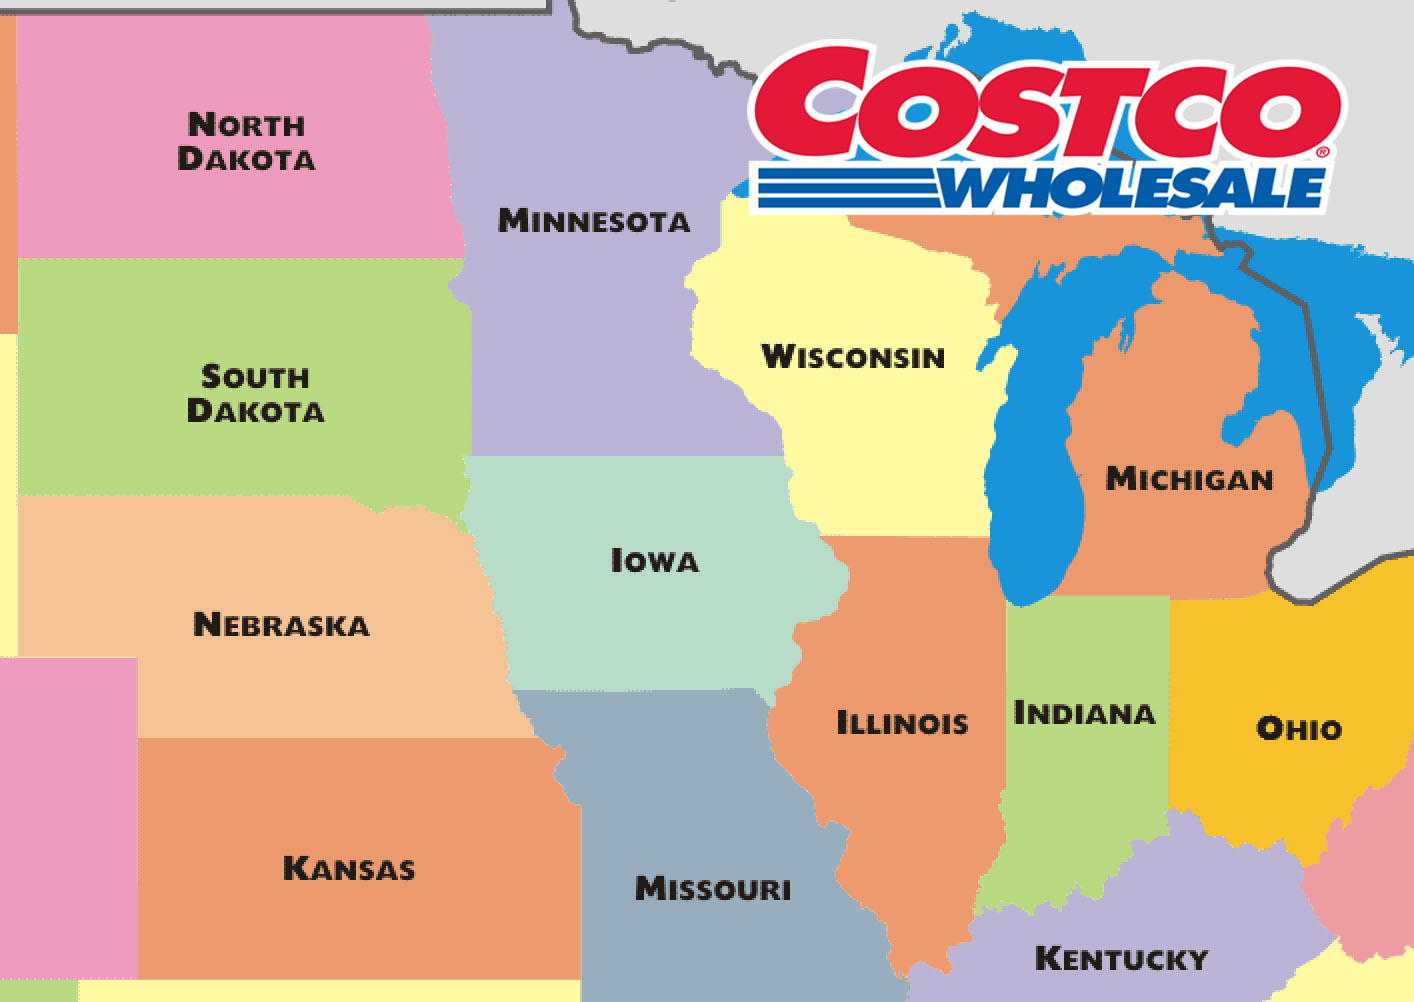 Costco Locations Minnesota Map.Midwest Costco Sampling 1 2 1 3 1 7 1 8 Garden Lites